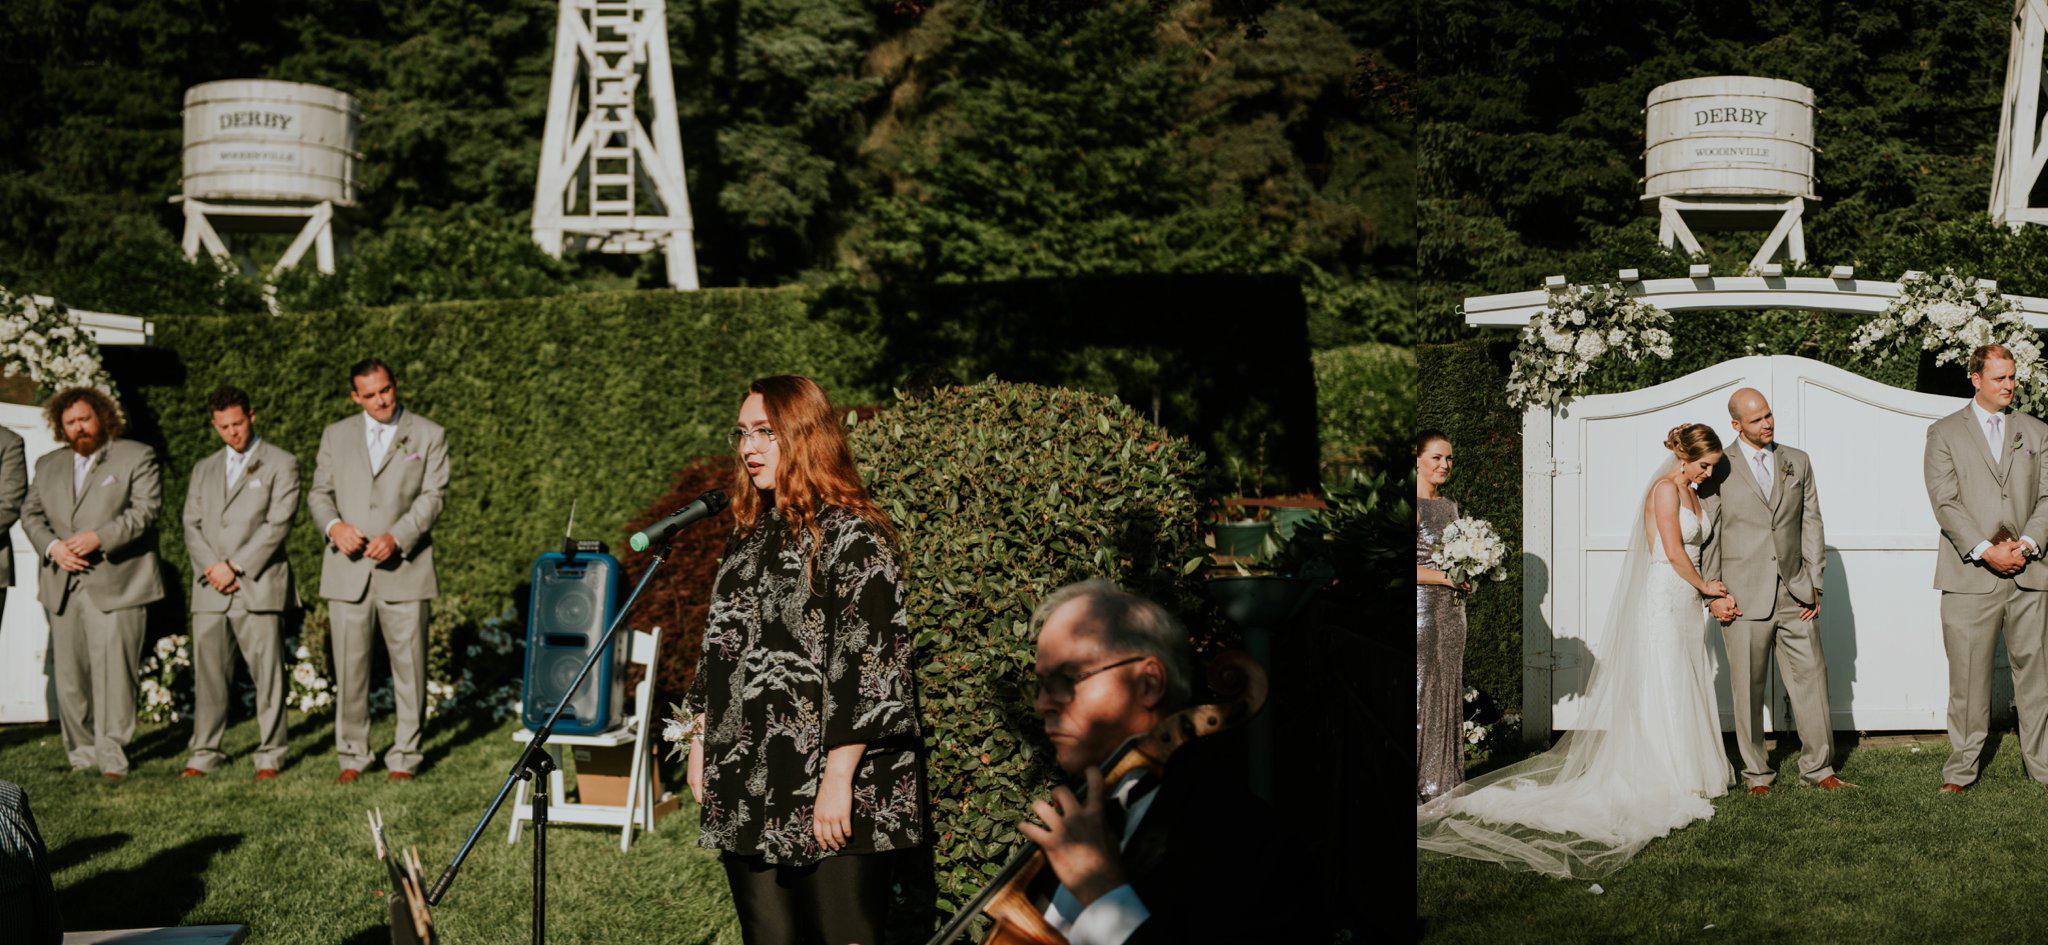 hollywood-school-house-wedding-seattle-photographer-caitlyn-nikula-78.jpg